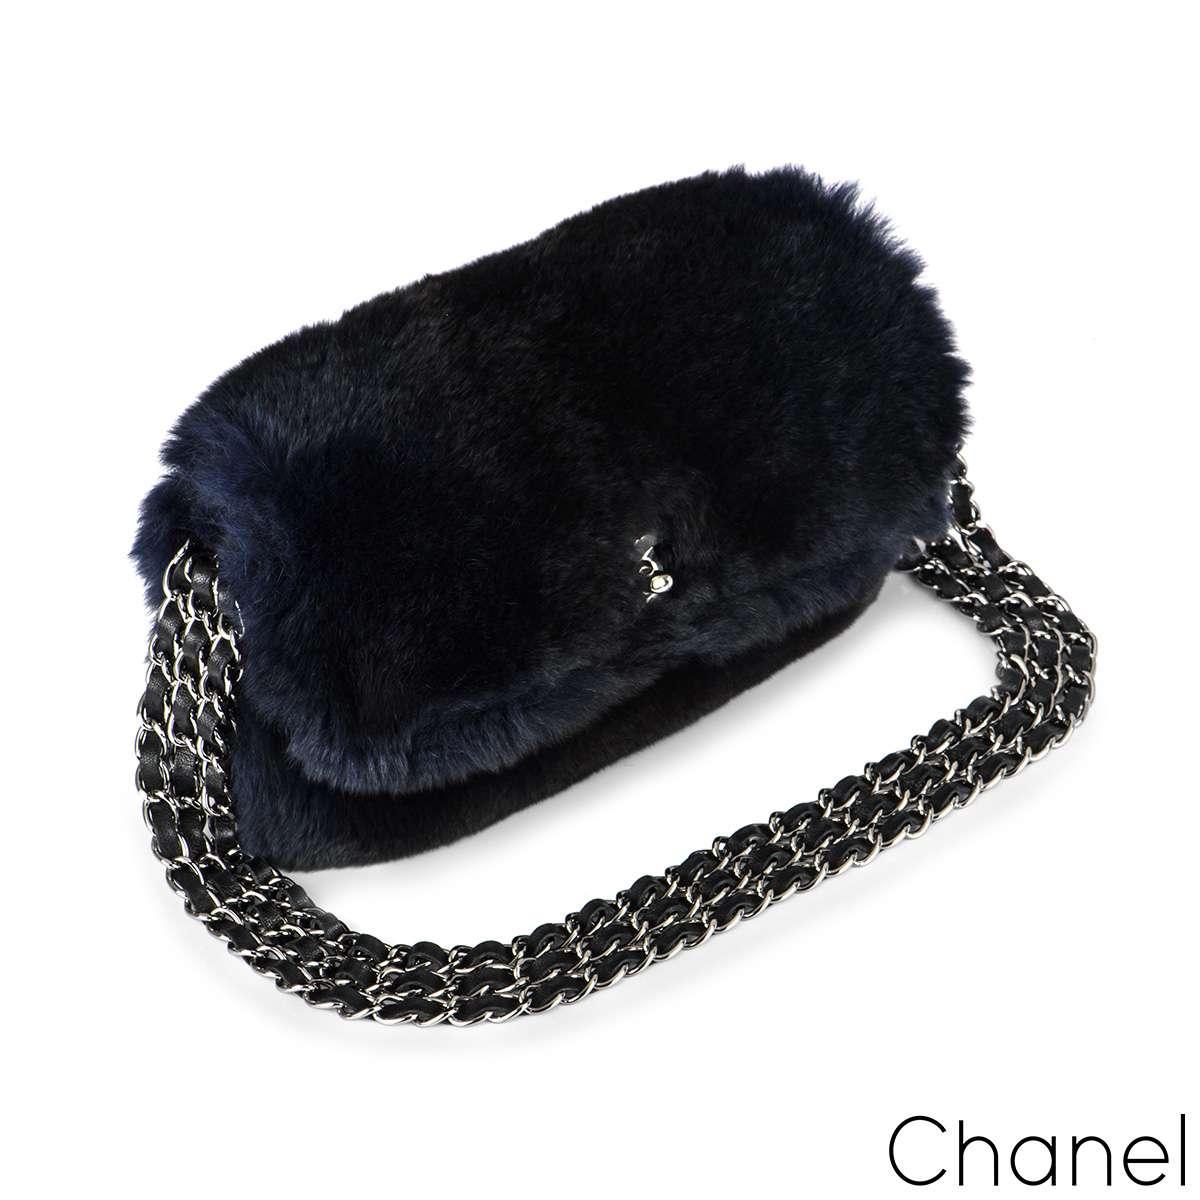 Chanel Orylag Triple Chain Flap Bag